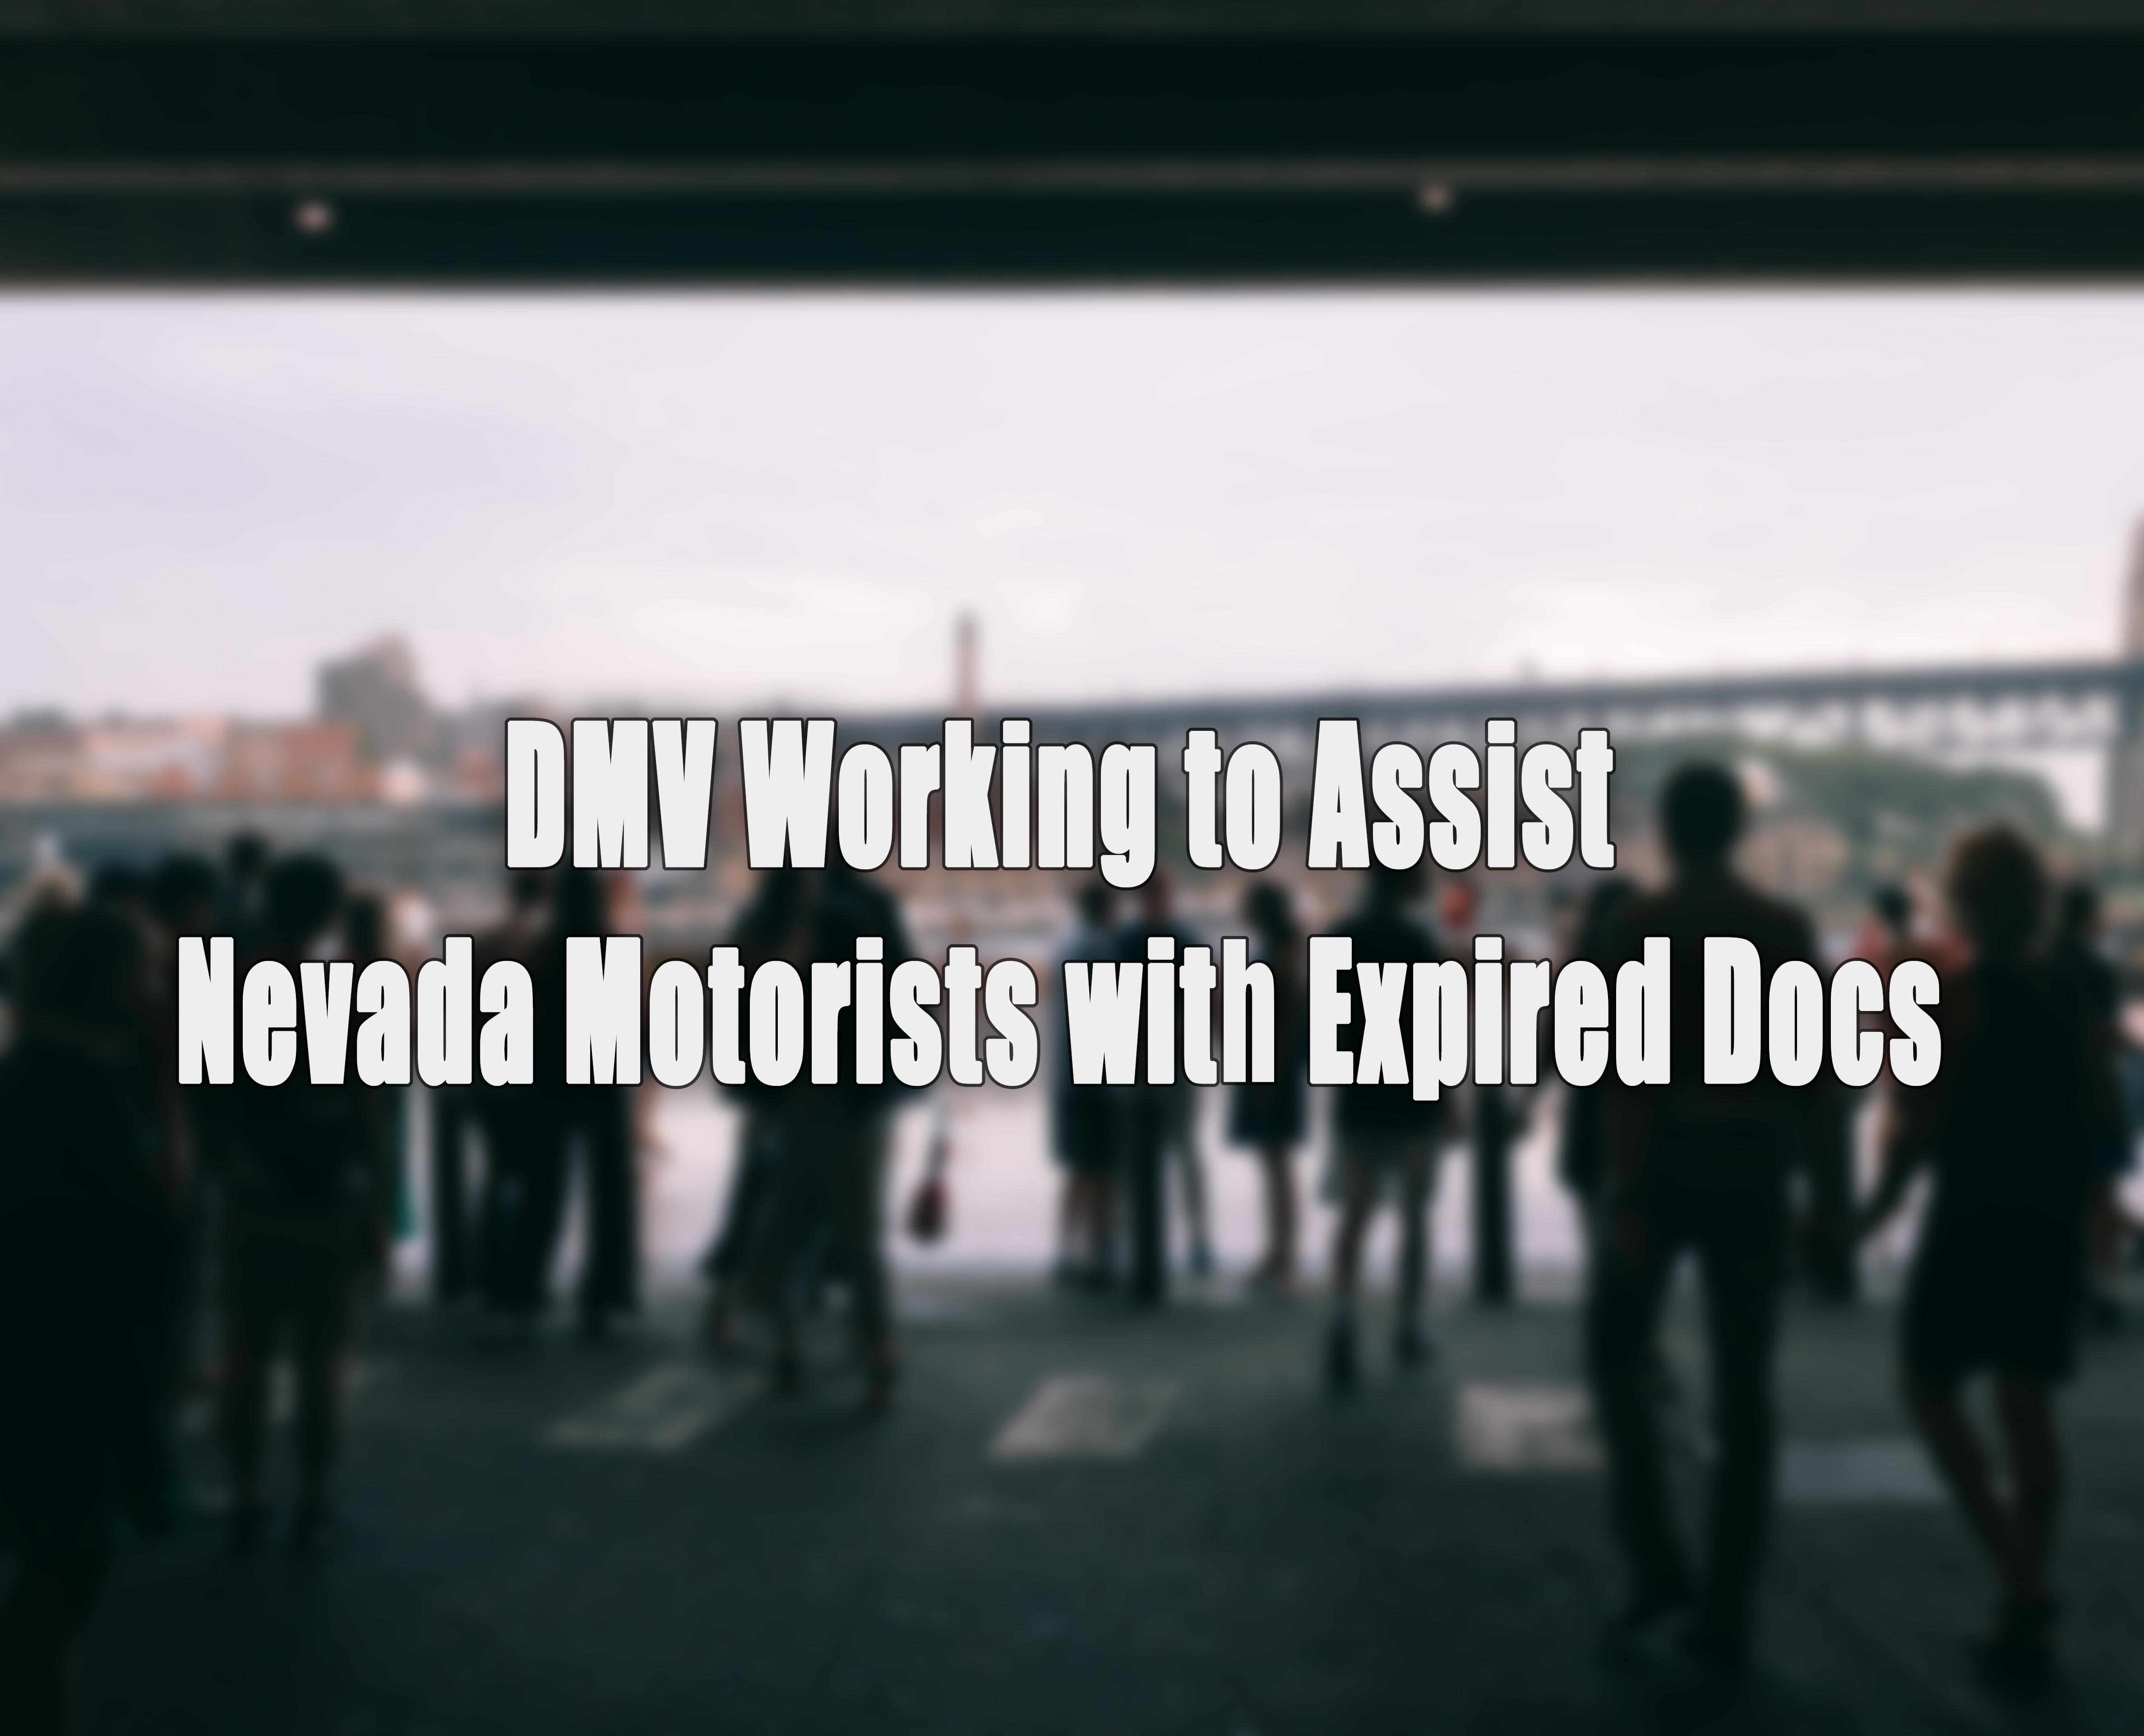 DMV in Las Vegas.jpg